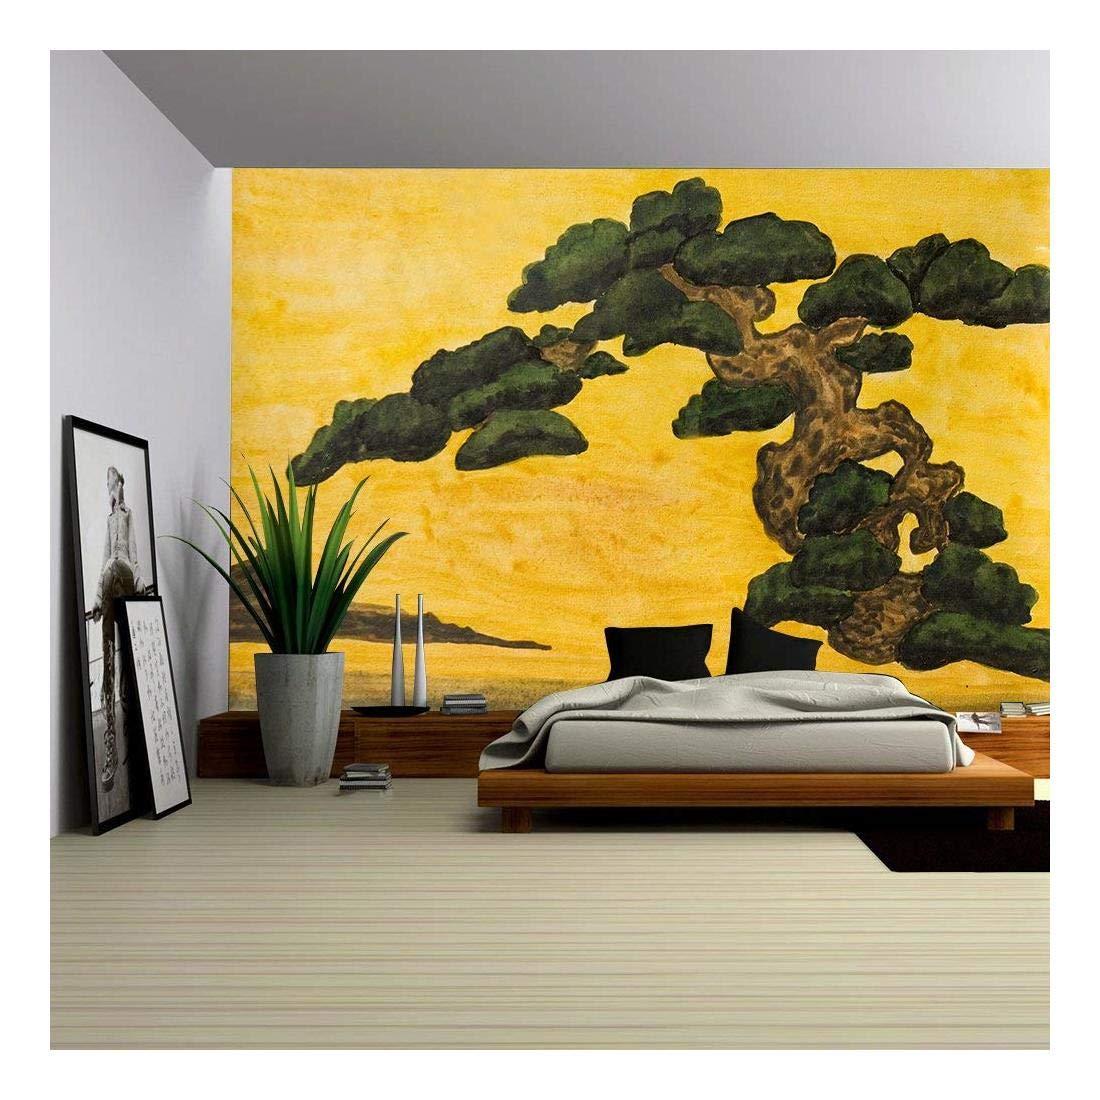 Wallpaper Large Wall Mural Series ( Artwork 27) - Wall Murals | Wall26